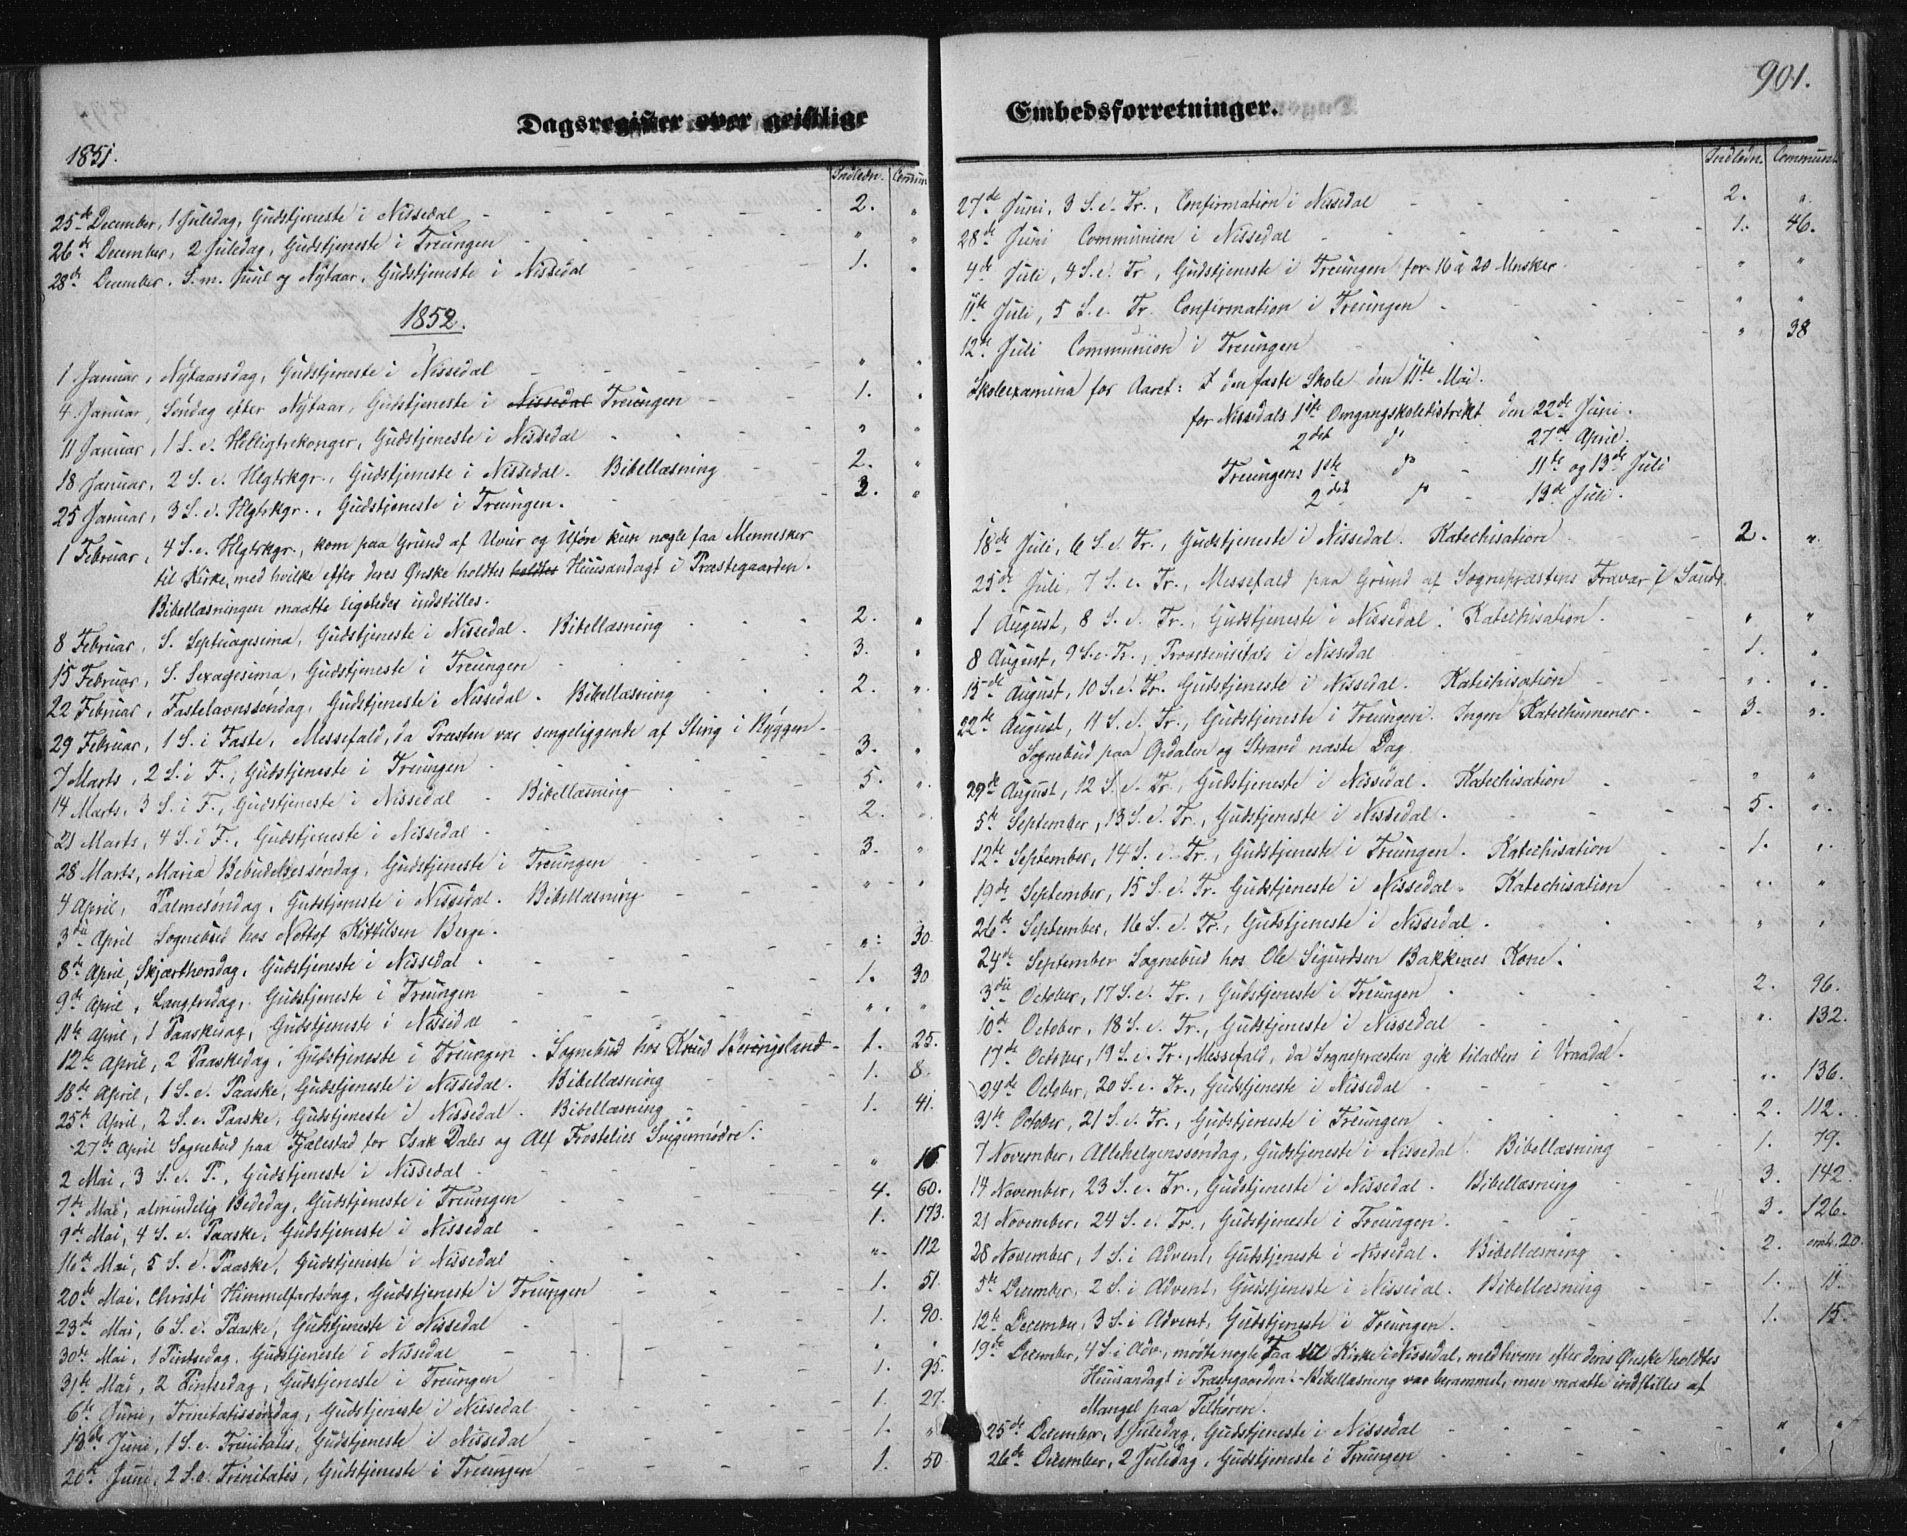 SAKO, Nissedal kirkebøker, F/Fa/L0003: Ministerialbok nr. I 3, 1846-1870, s. 900-901